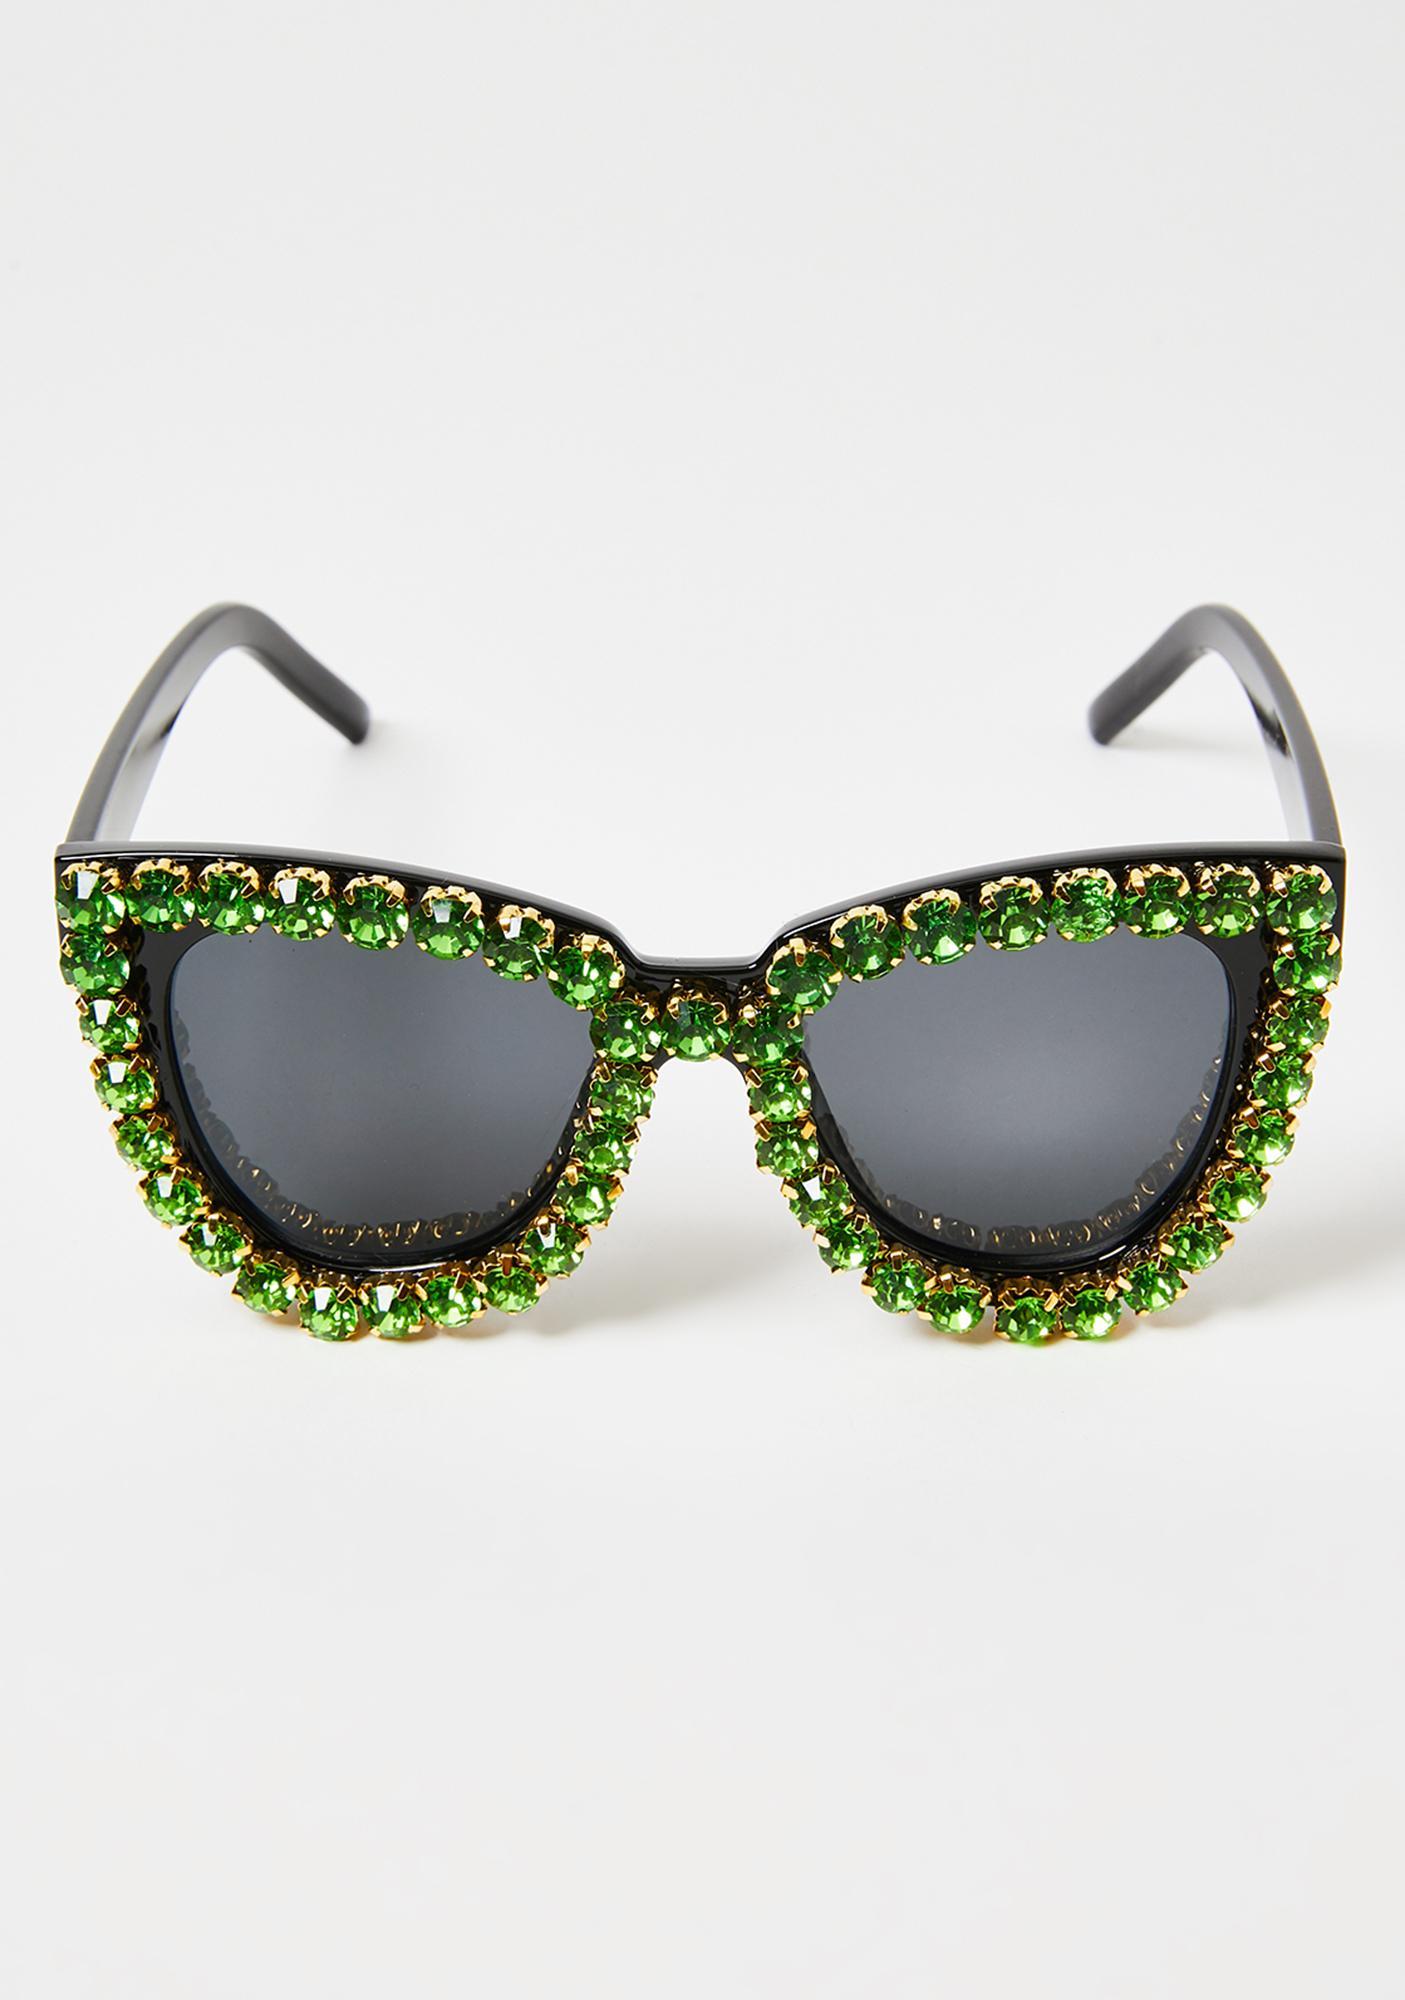 Emerald Blame The Fame Cat Eye Sunglasses